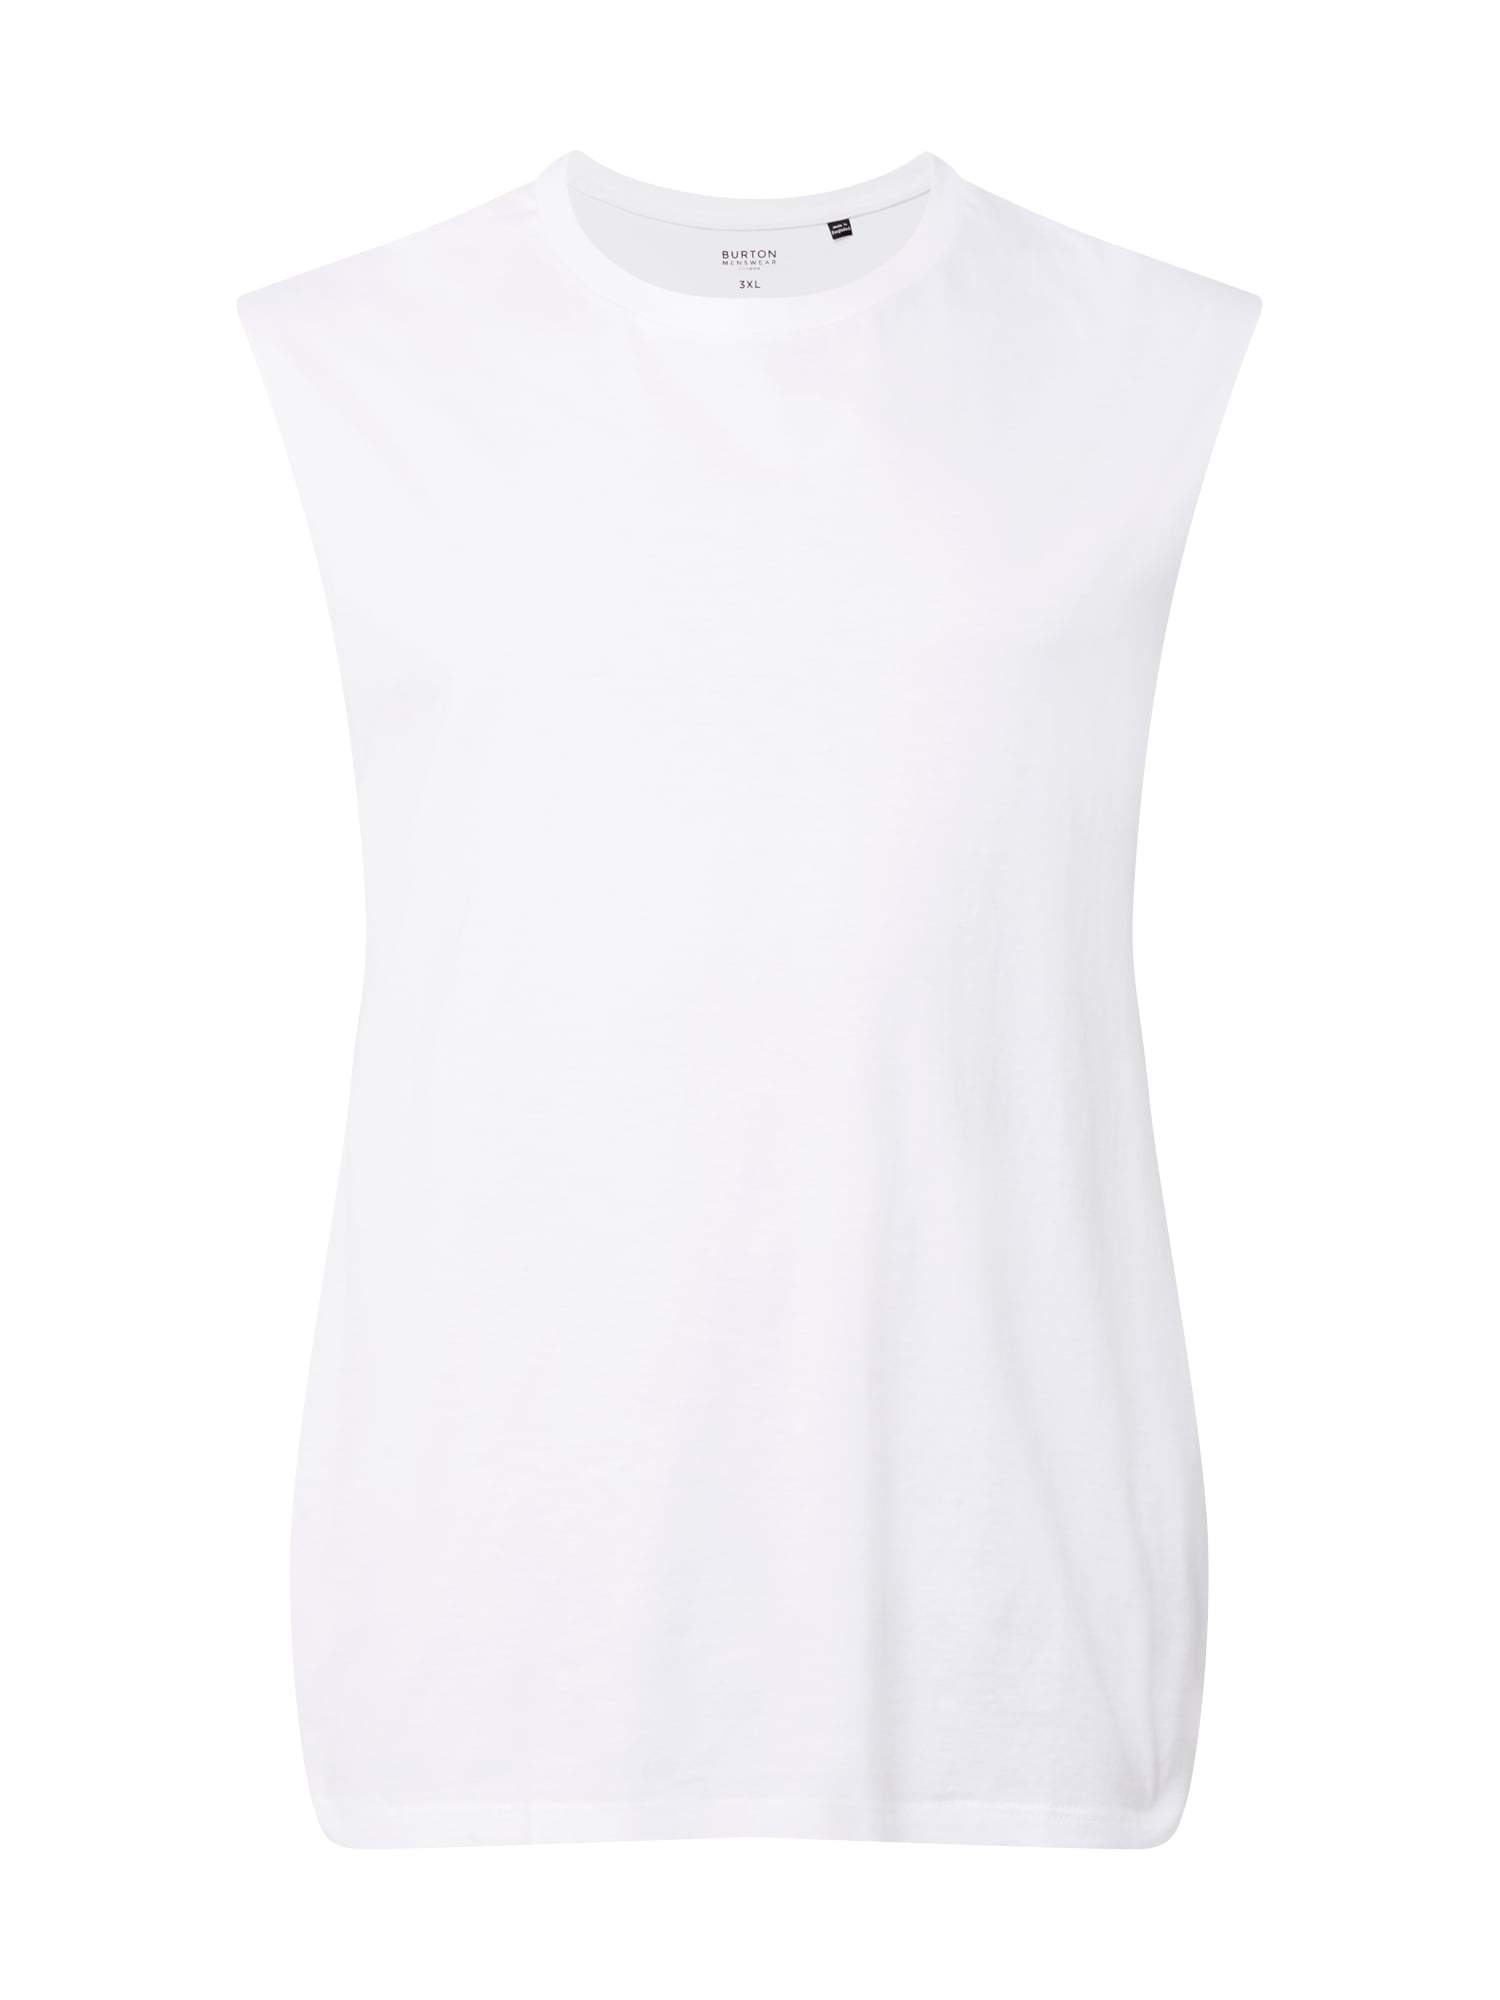 BURTON MENSWEAR LONDON (Big & Tall) Marškinėliai balta